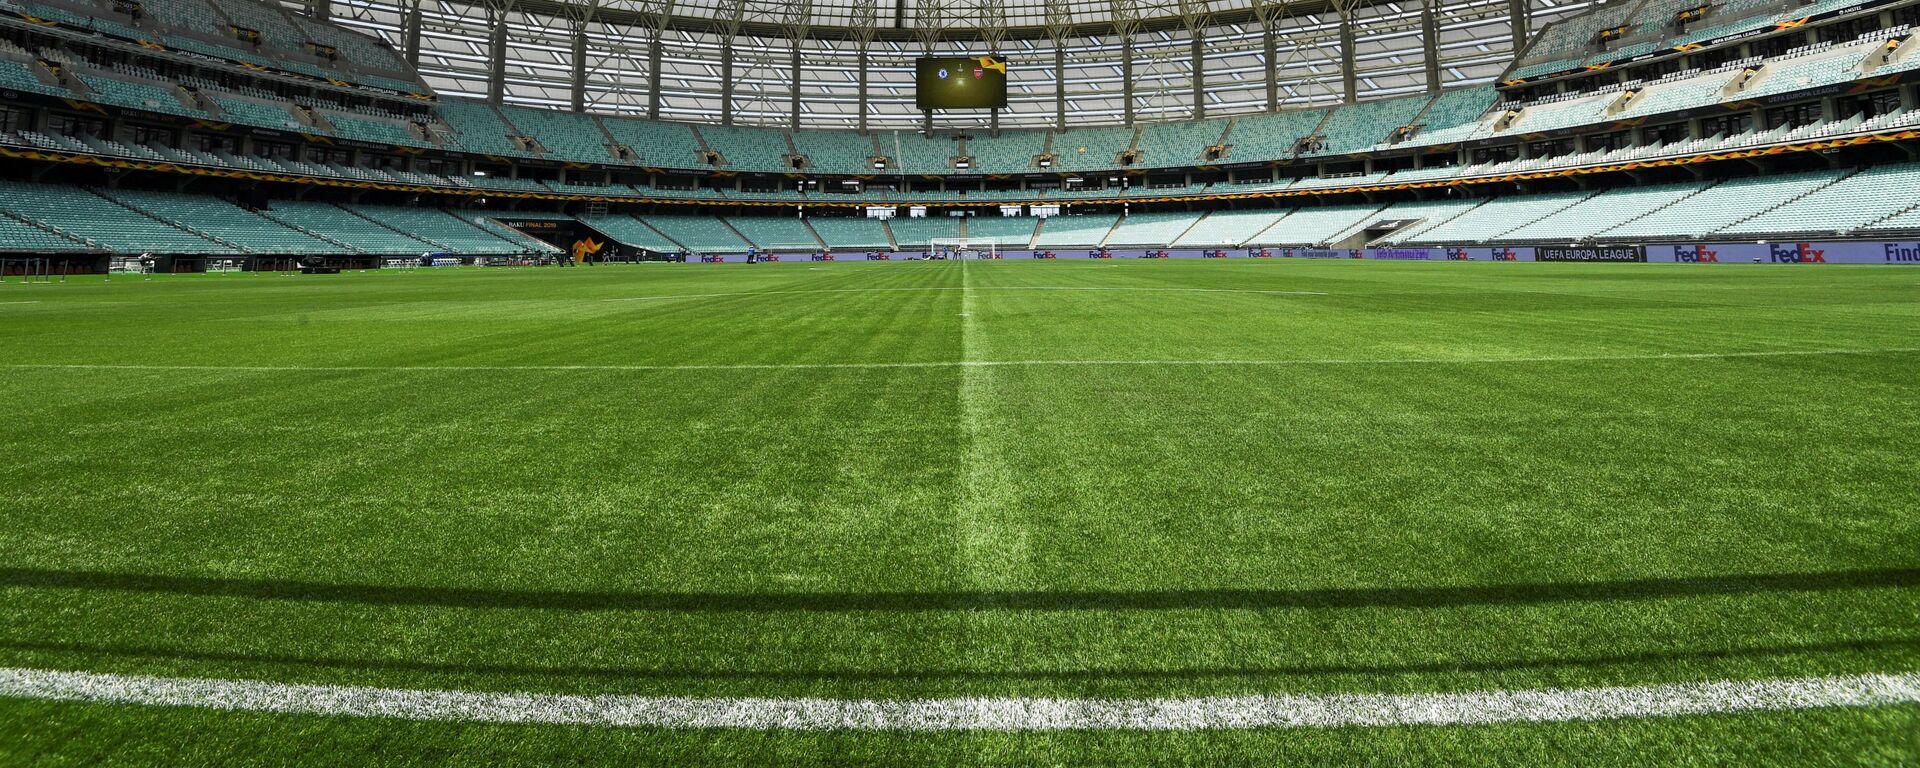 Бакинский Олимпийский стадион, фото из архива - Sputnik Азербайджан, 1920, 08.04.2021